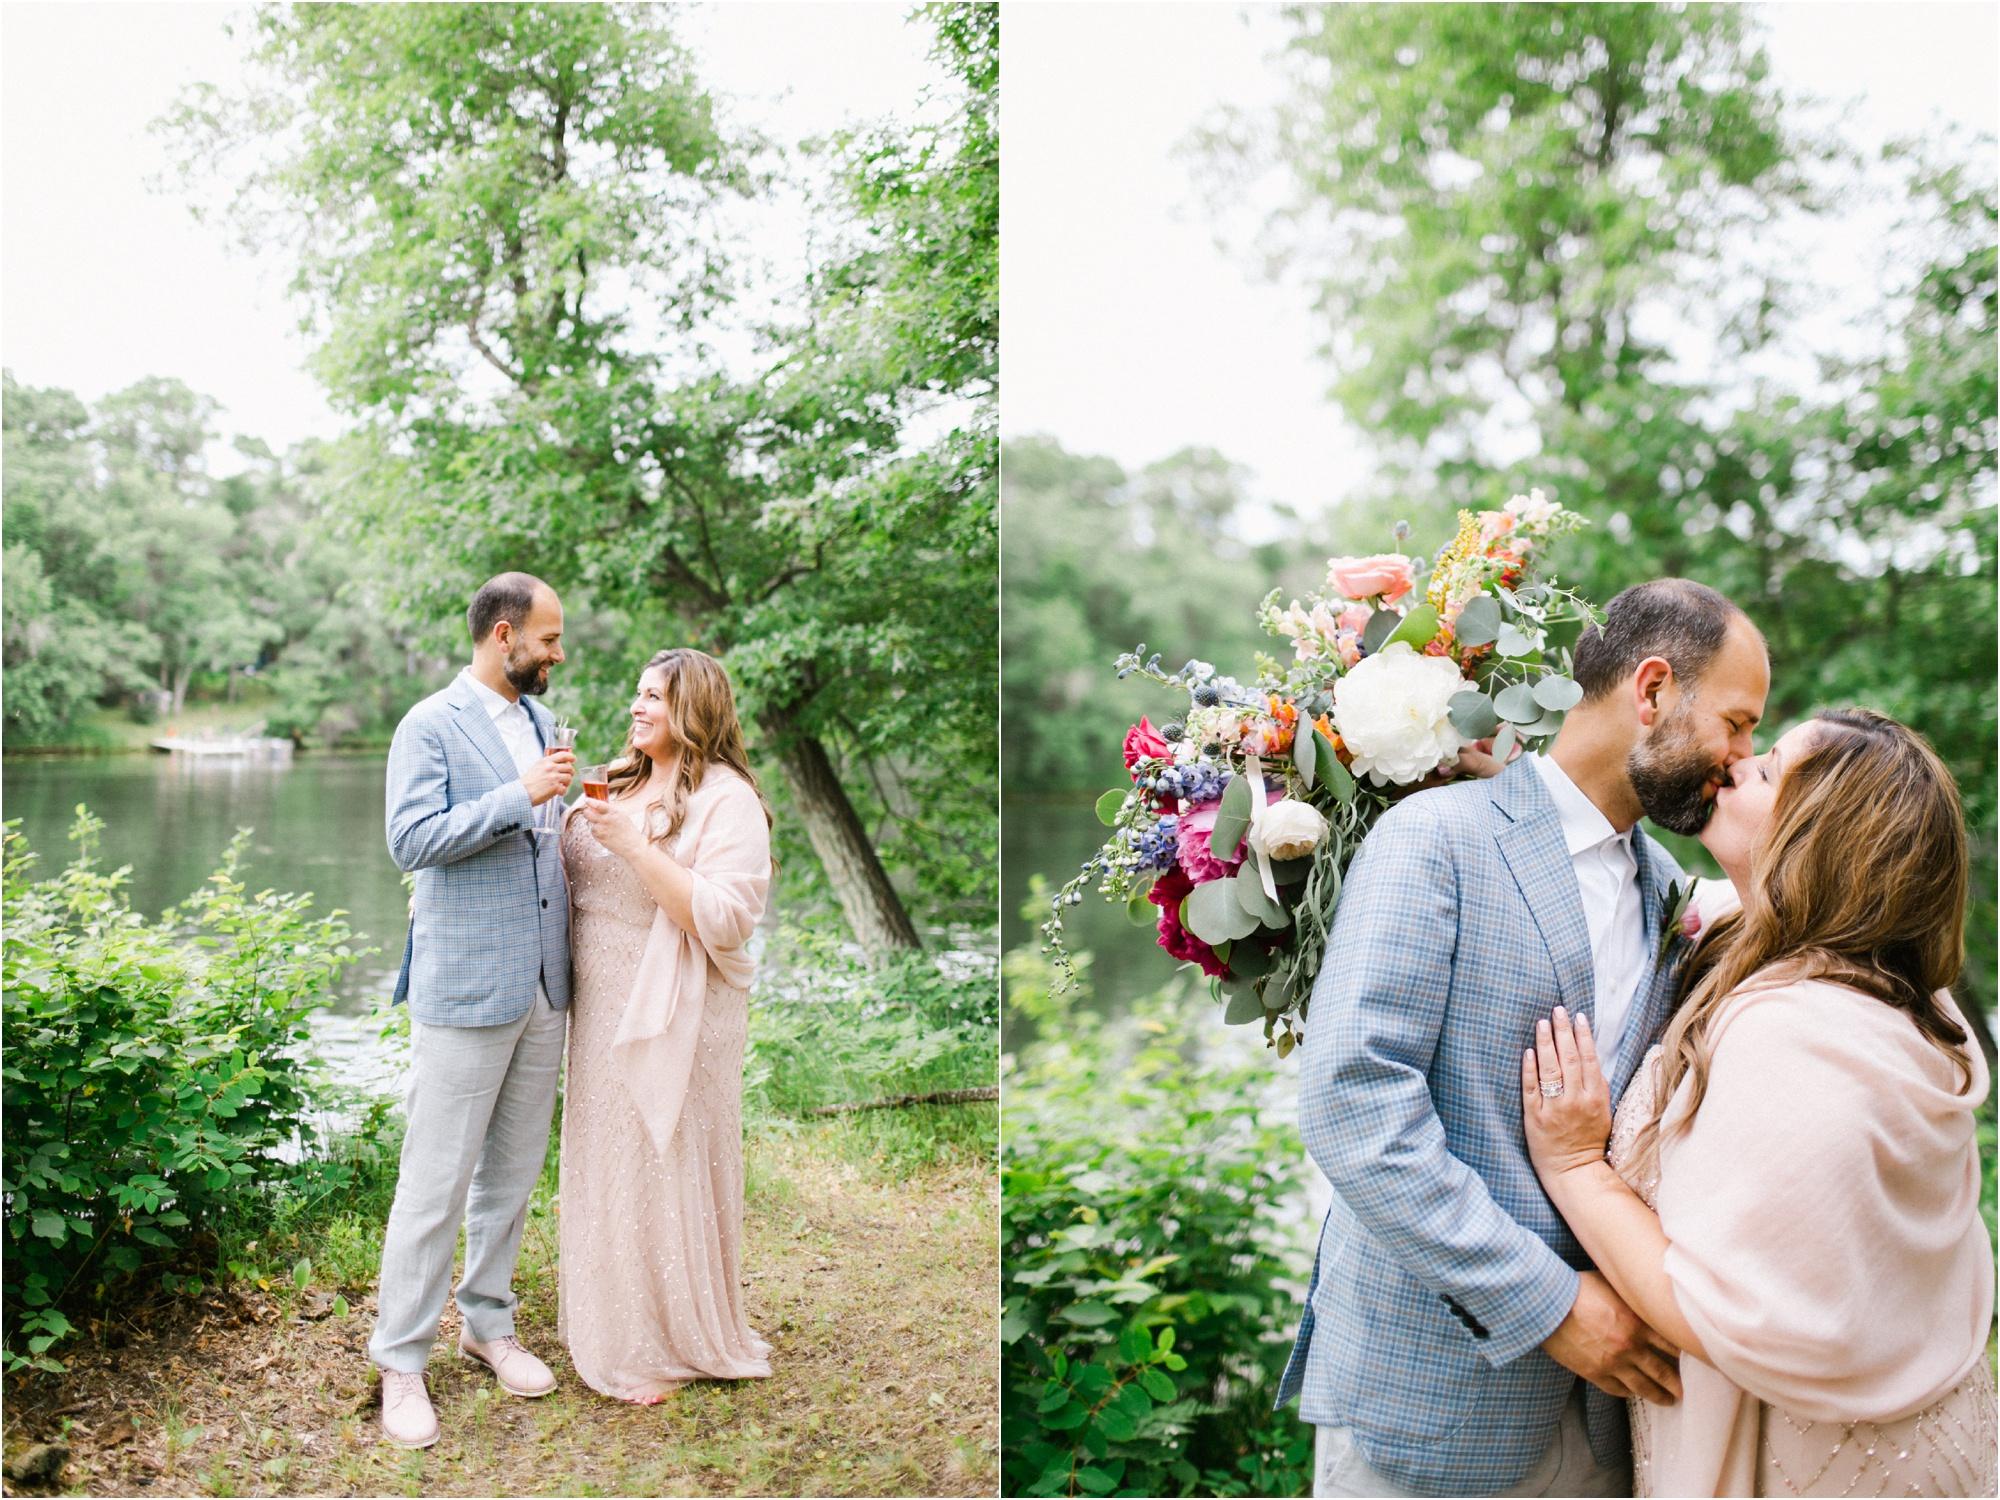 Wedding Photography Brainerd MN Aimee Jobe Photography Private Lake Residence Bloom Designs_0052.jpg